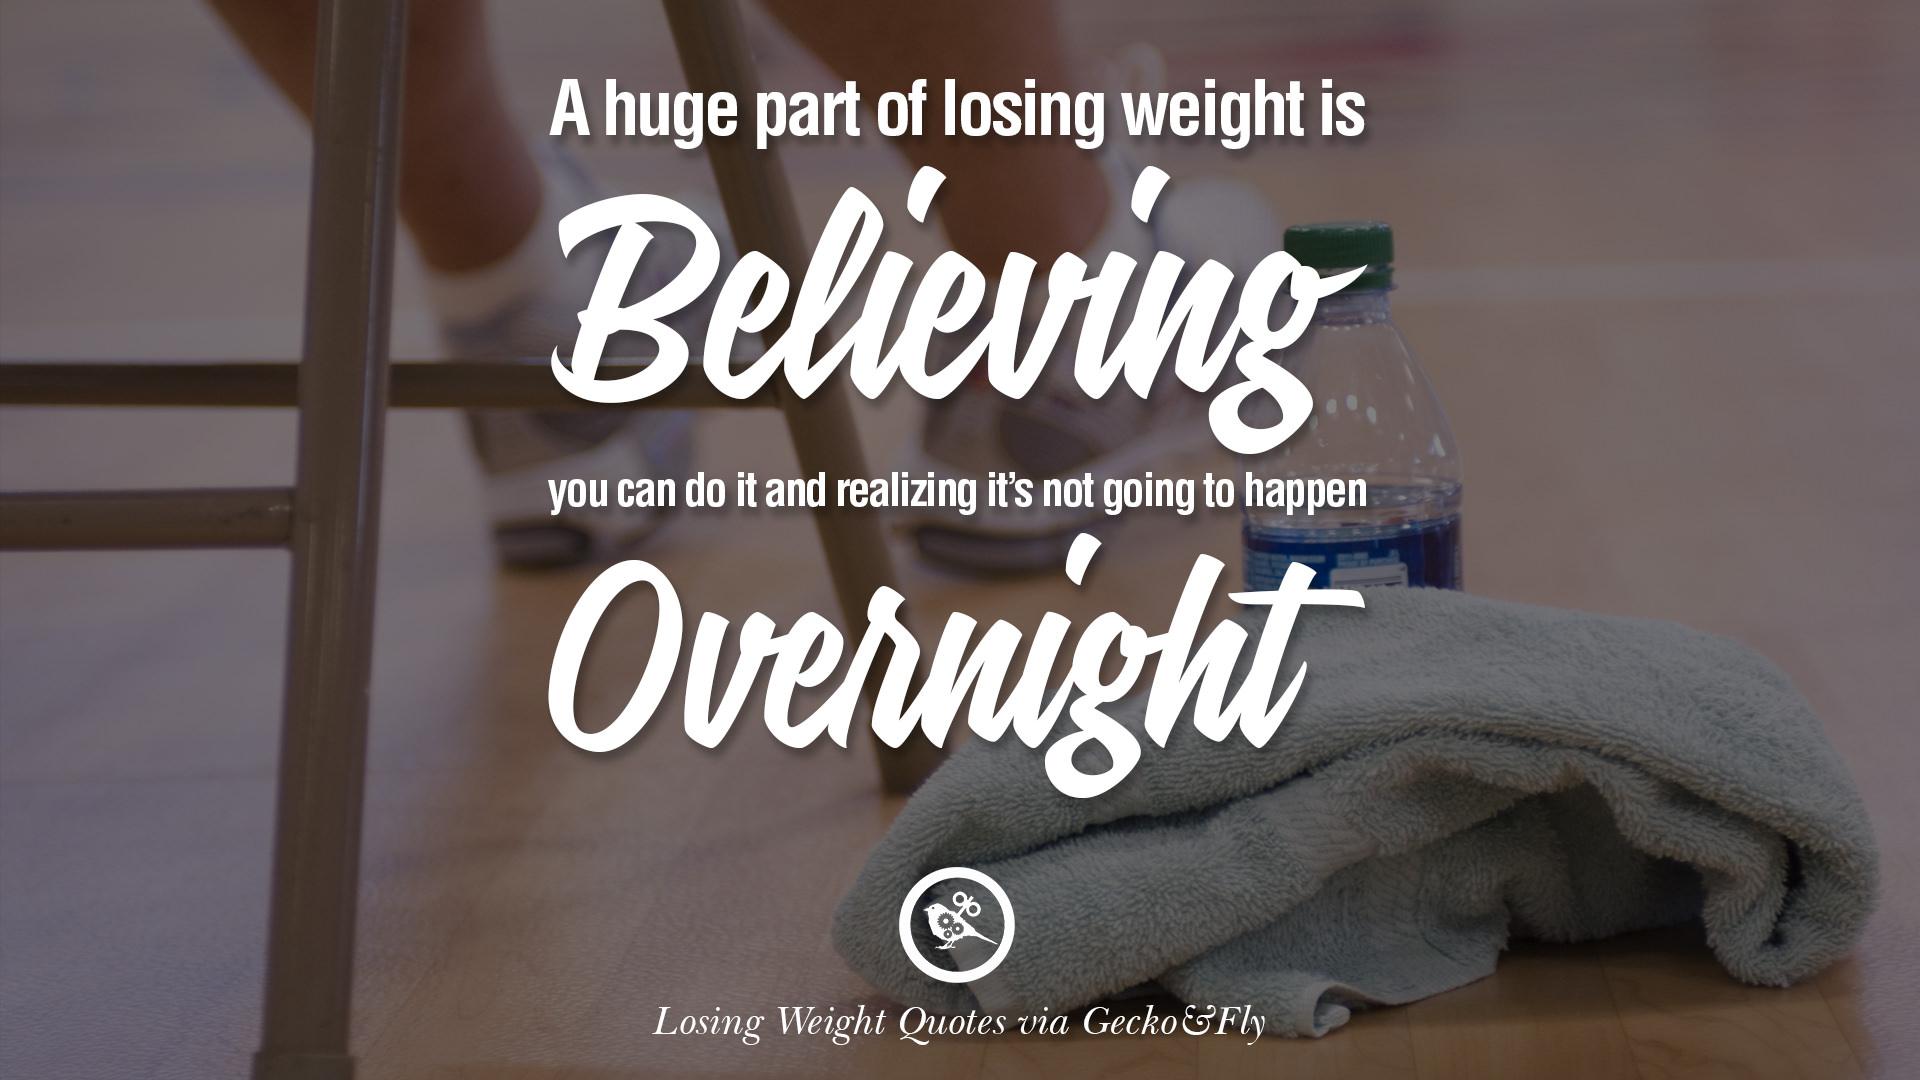 losing-weight-diet-quotes-instagram-pinterest-facebook-32.jpg